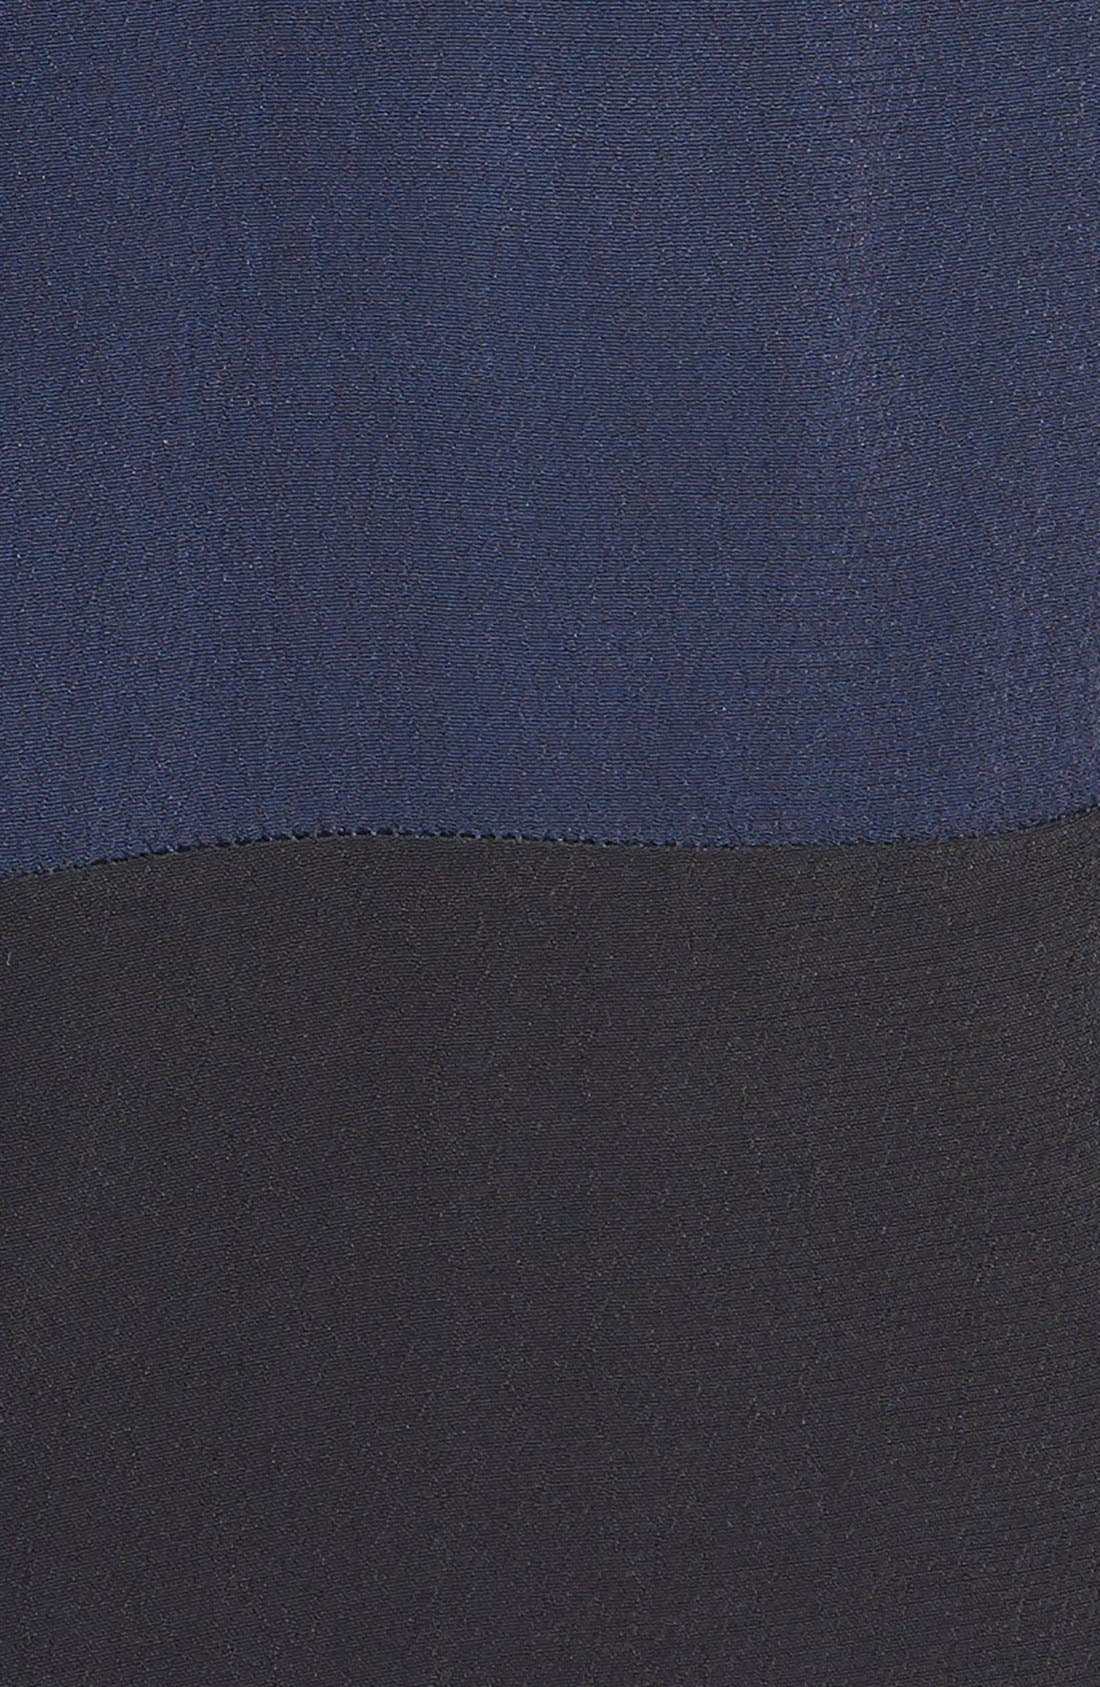 Colorblock Shirtdress,                             Alternate thumbnail 3, color,                             411